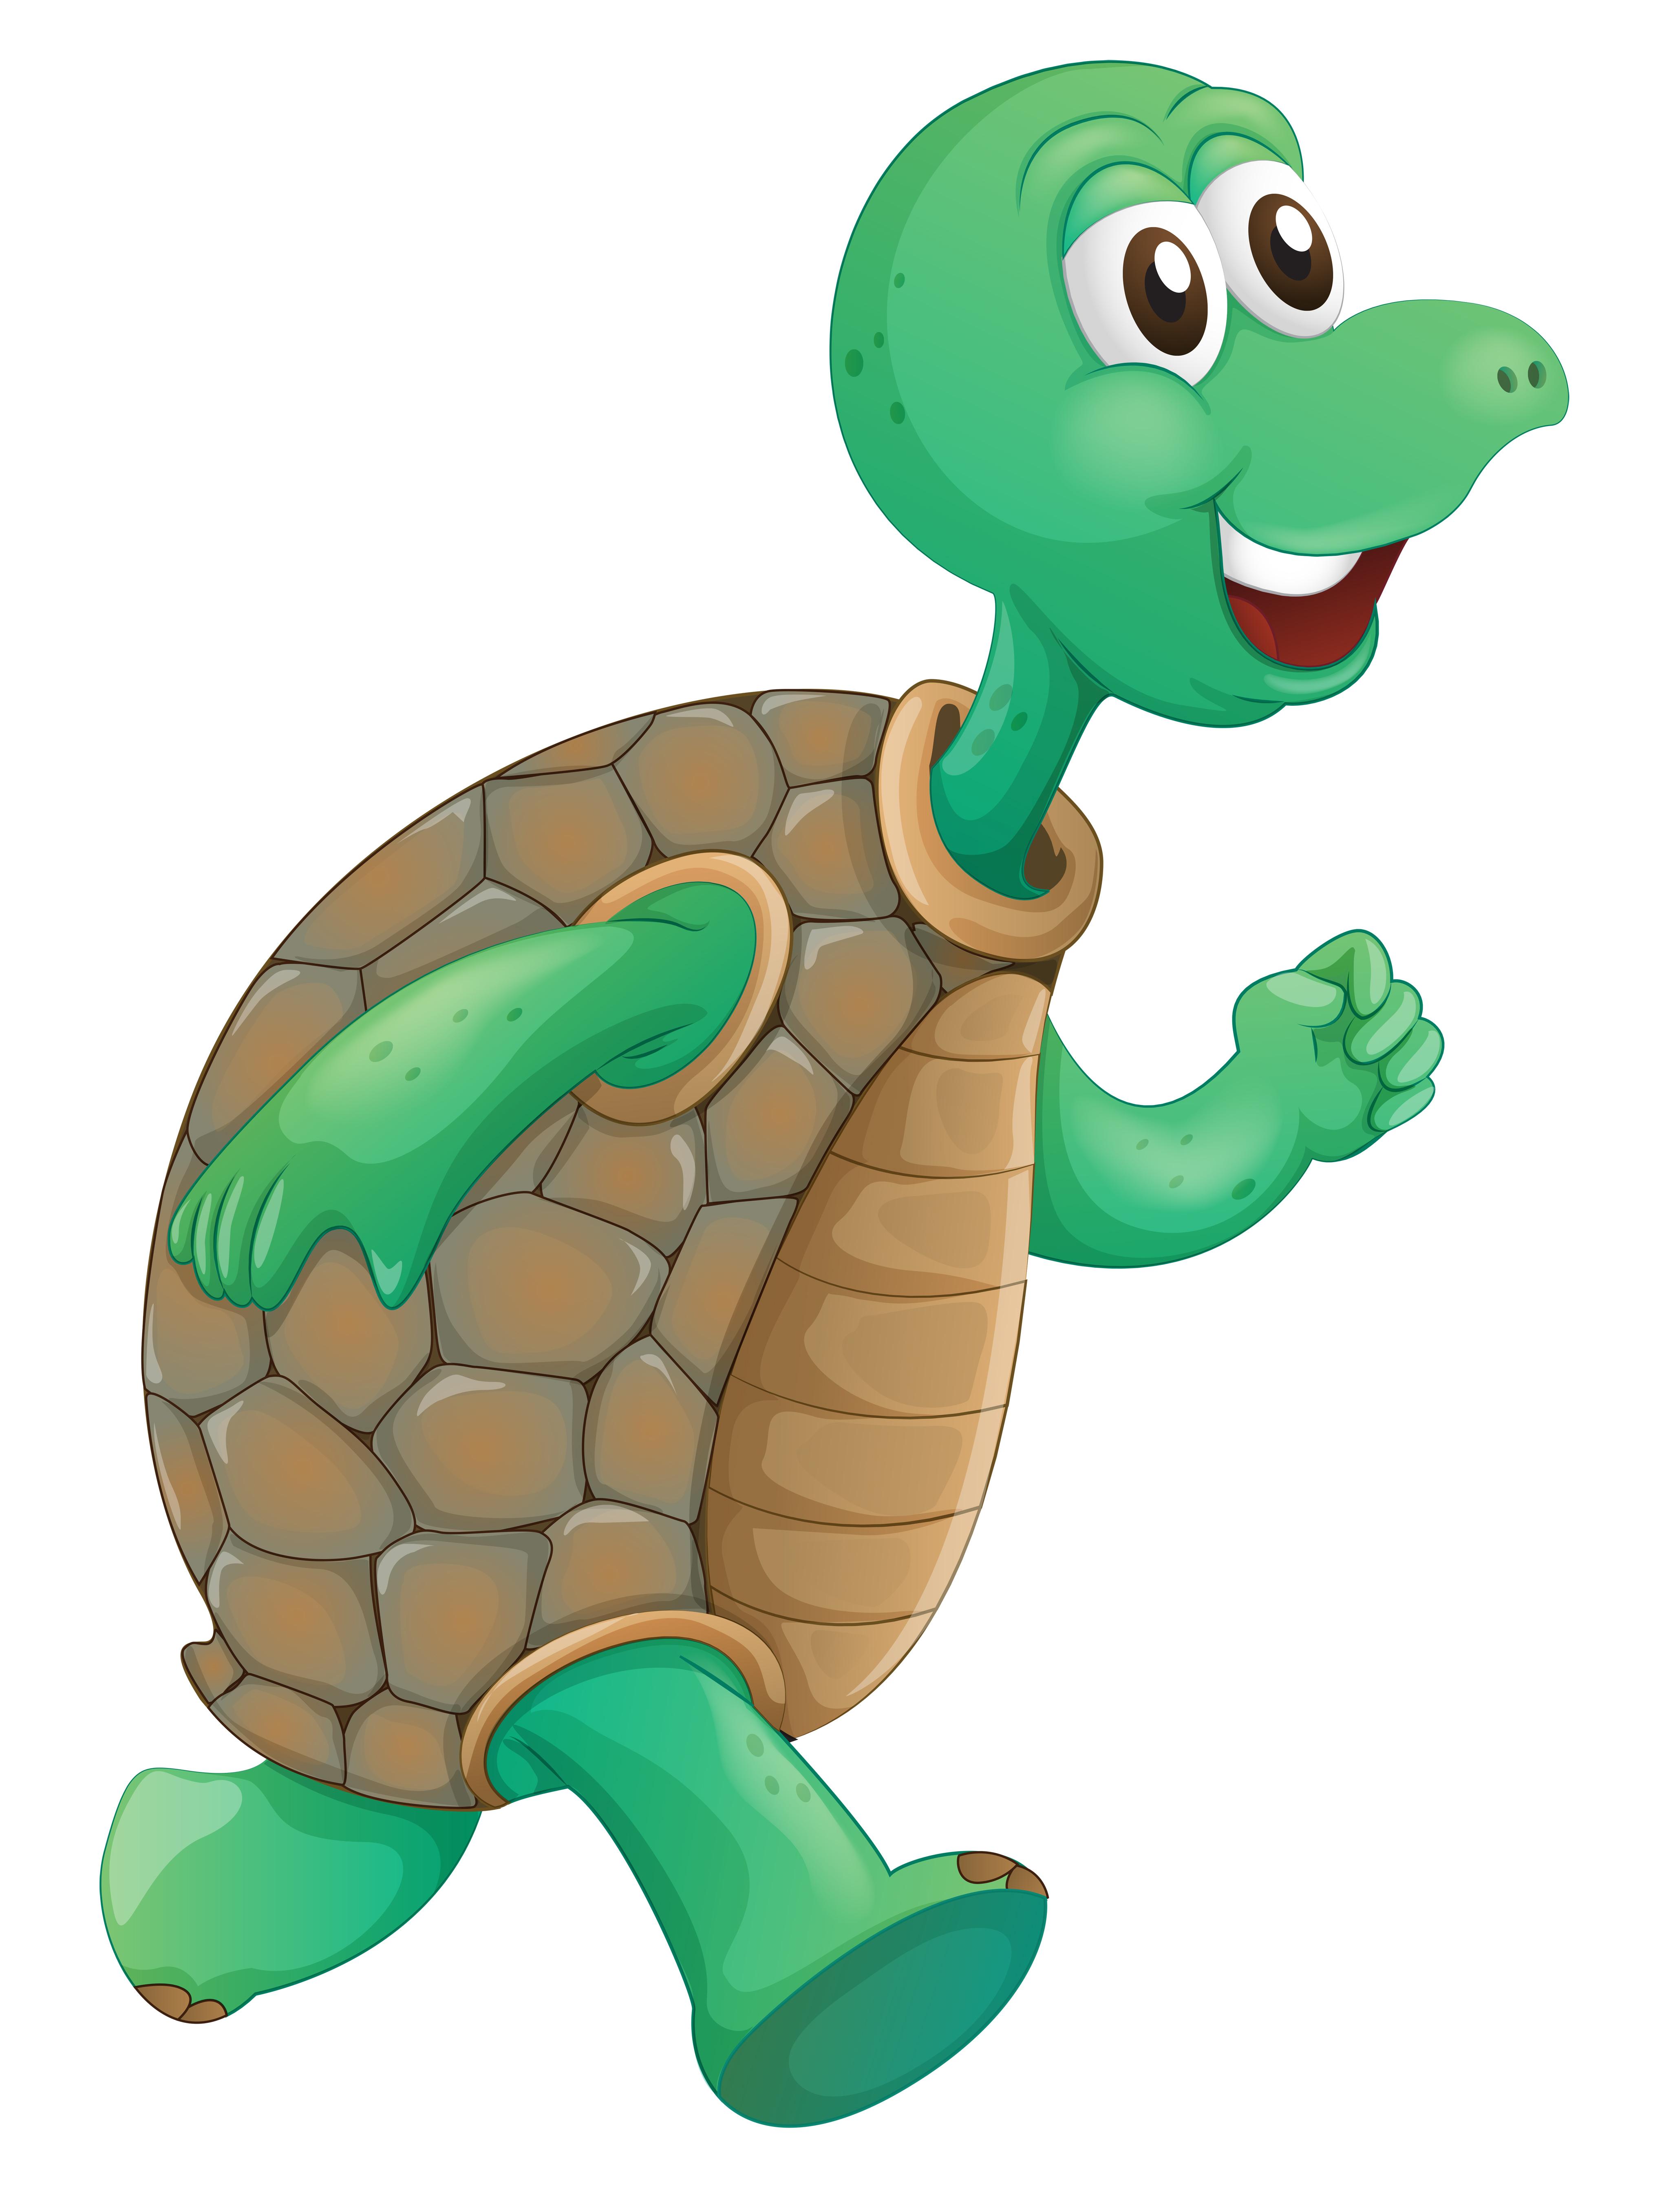 Running Turtle Free Vector Art - (22 Free Downloads)